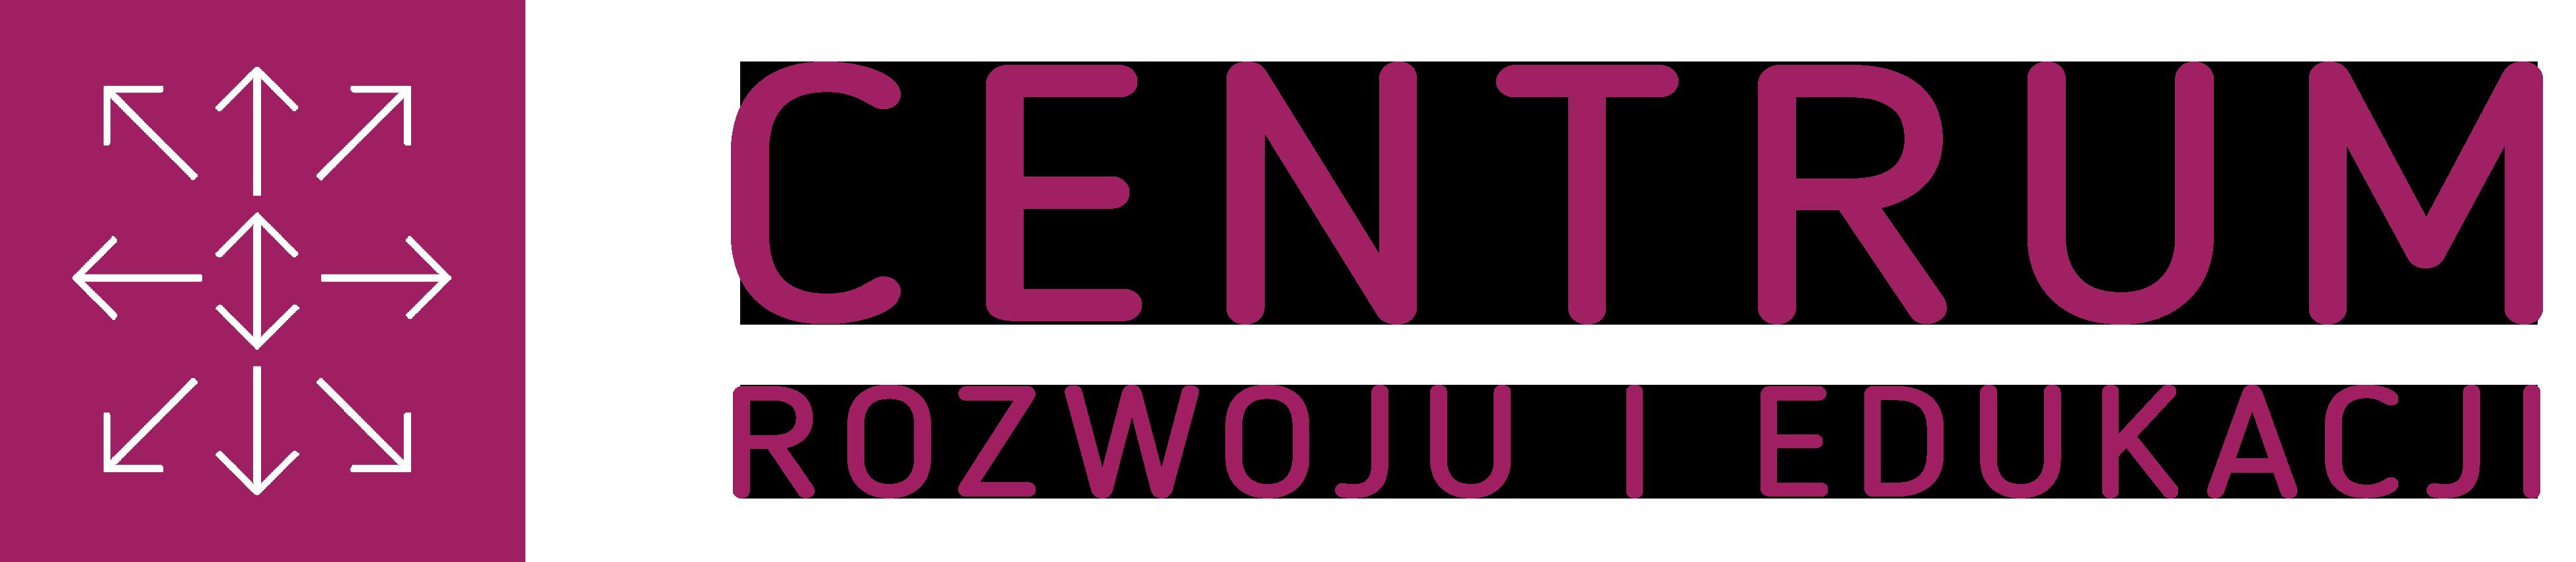 Logo Centrum Rozwoju i Edukacji Karina Indryka